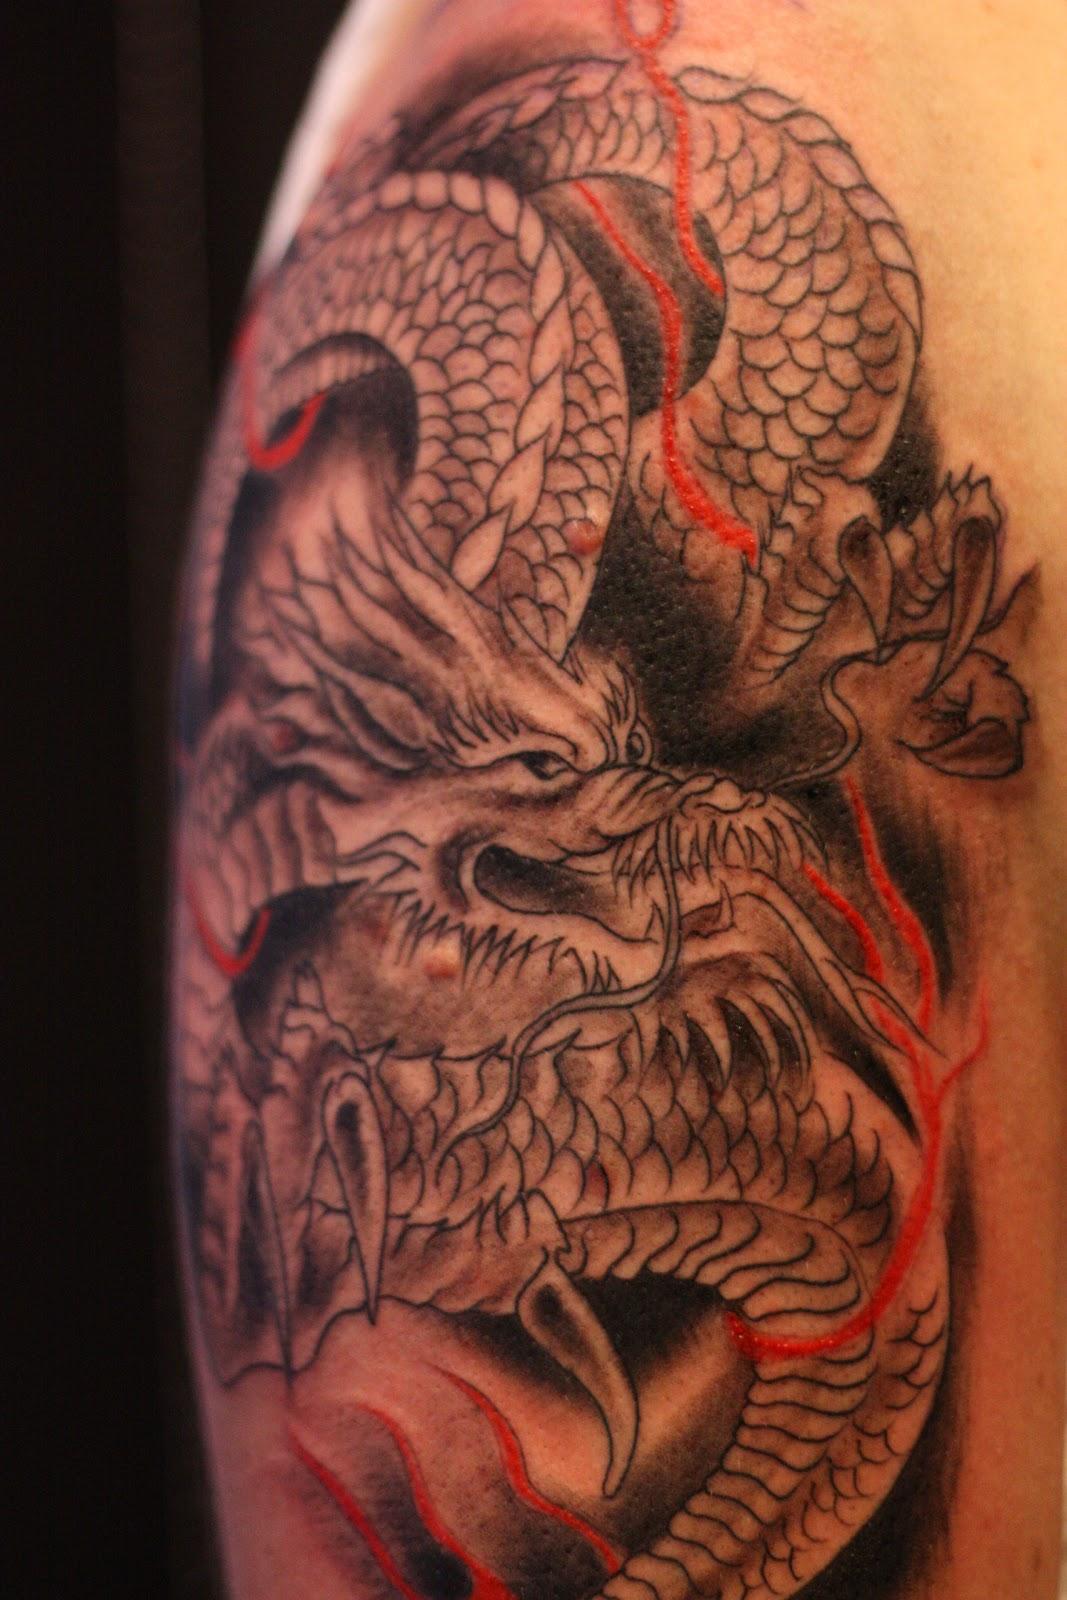 Little bird tattoo februari 2011 for Little dragon tattoo